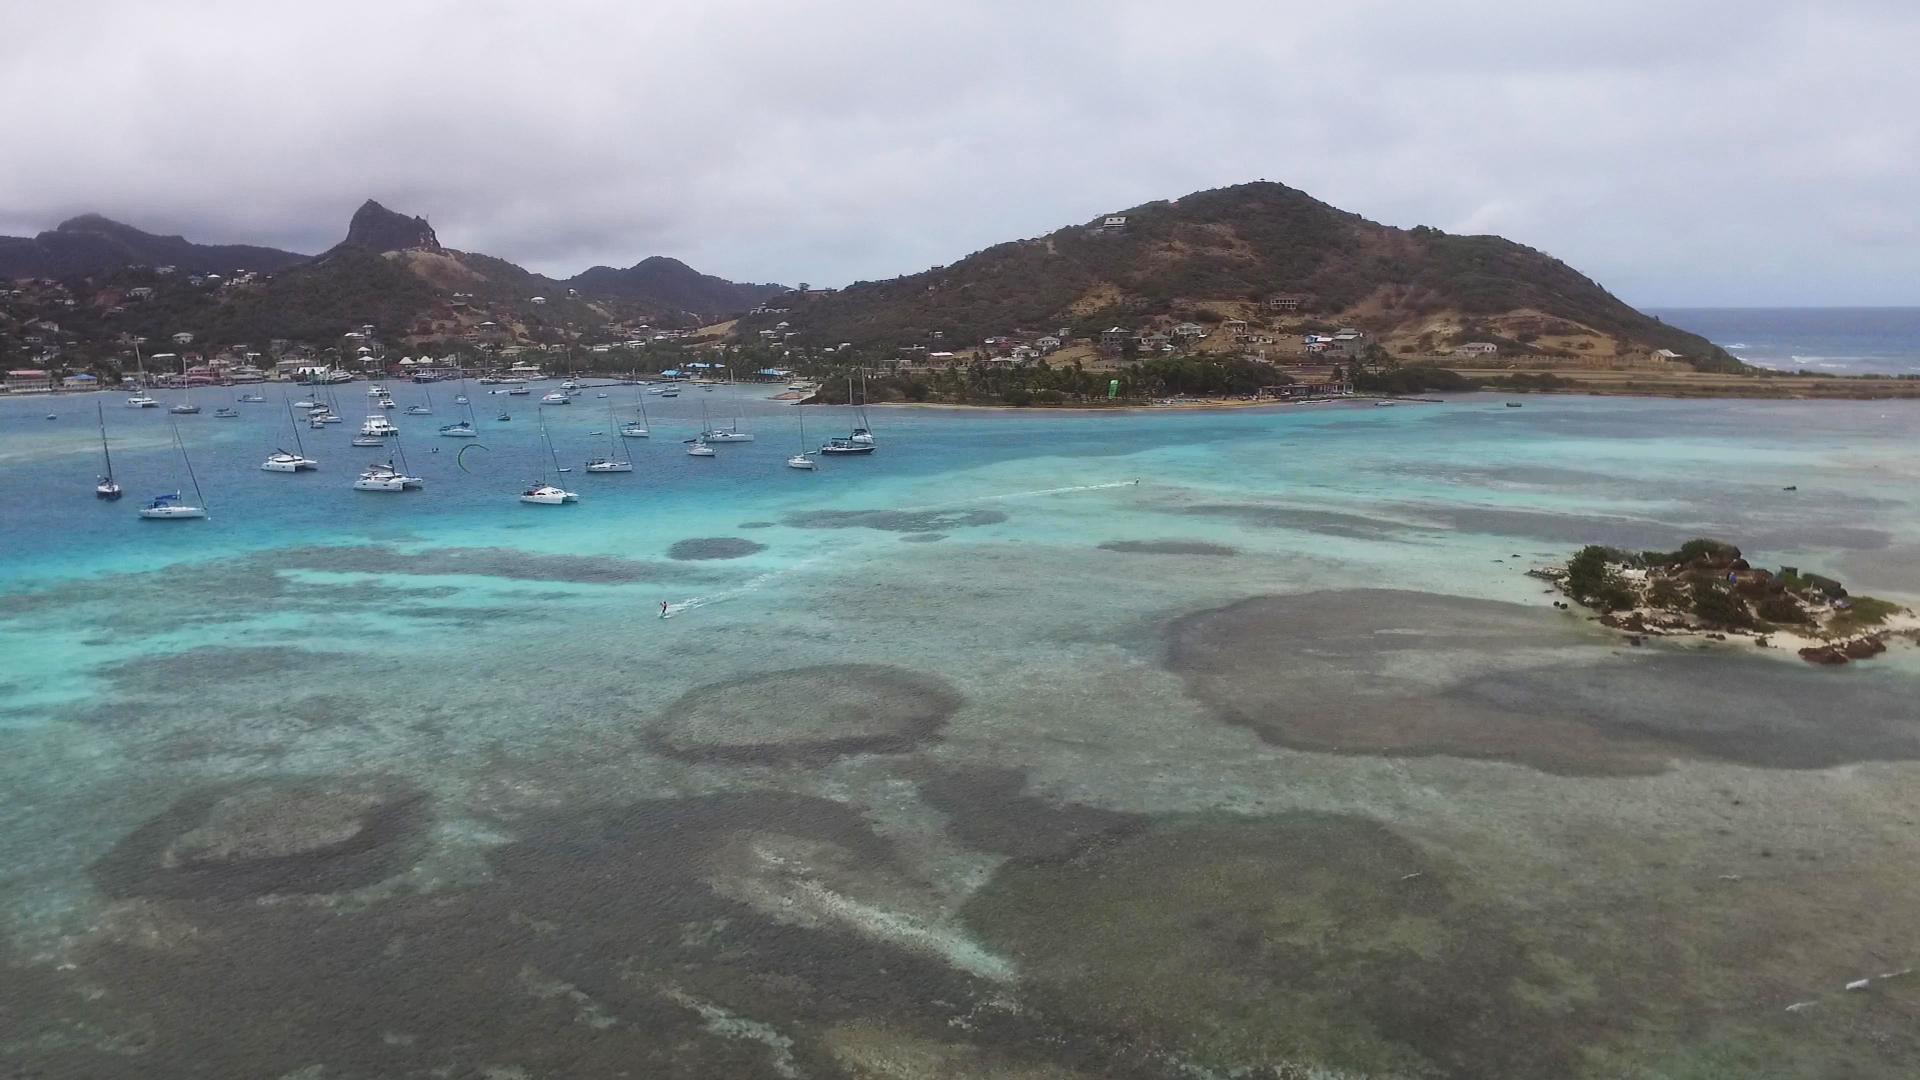 kitesurfing cruise grenadines union island 1.jpg